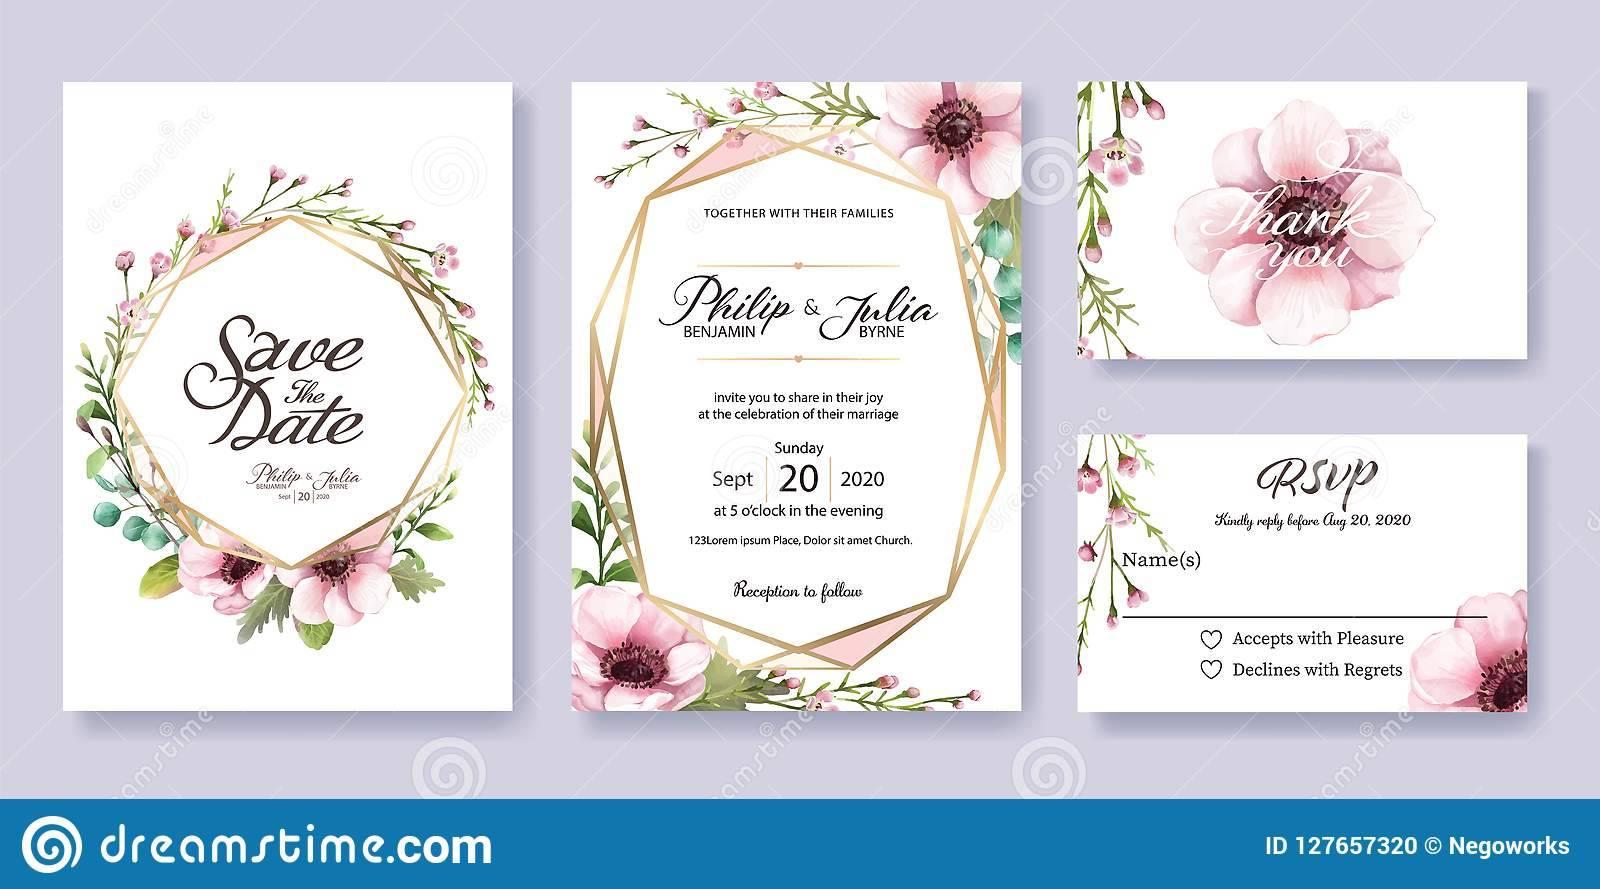 Invitation Card Rsvp Template